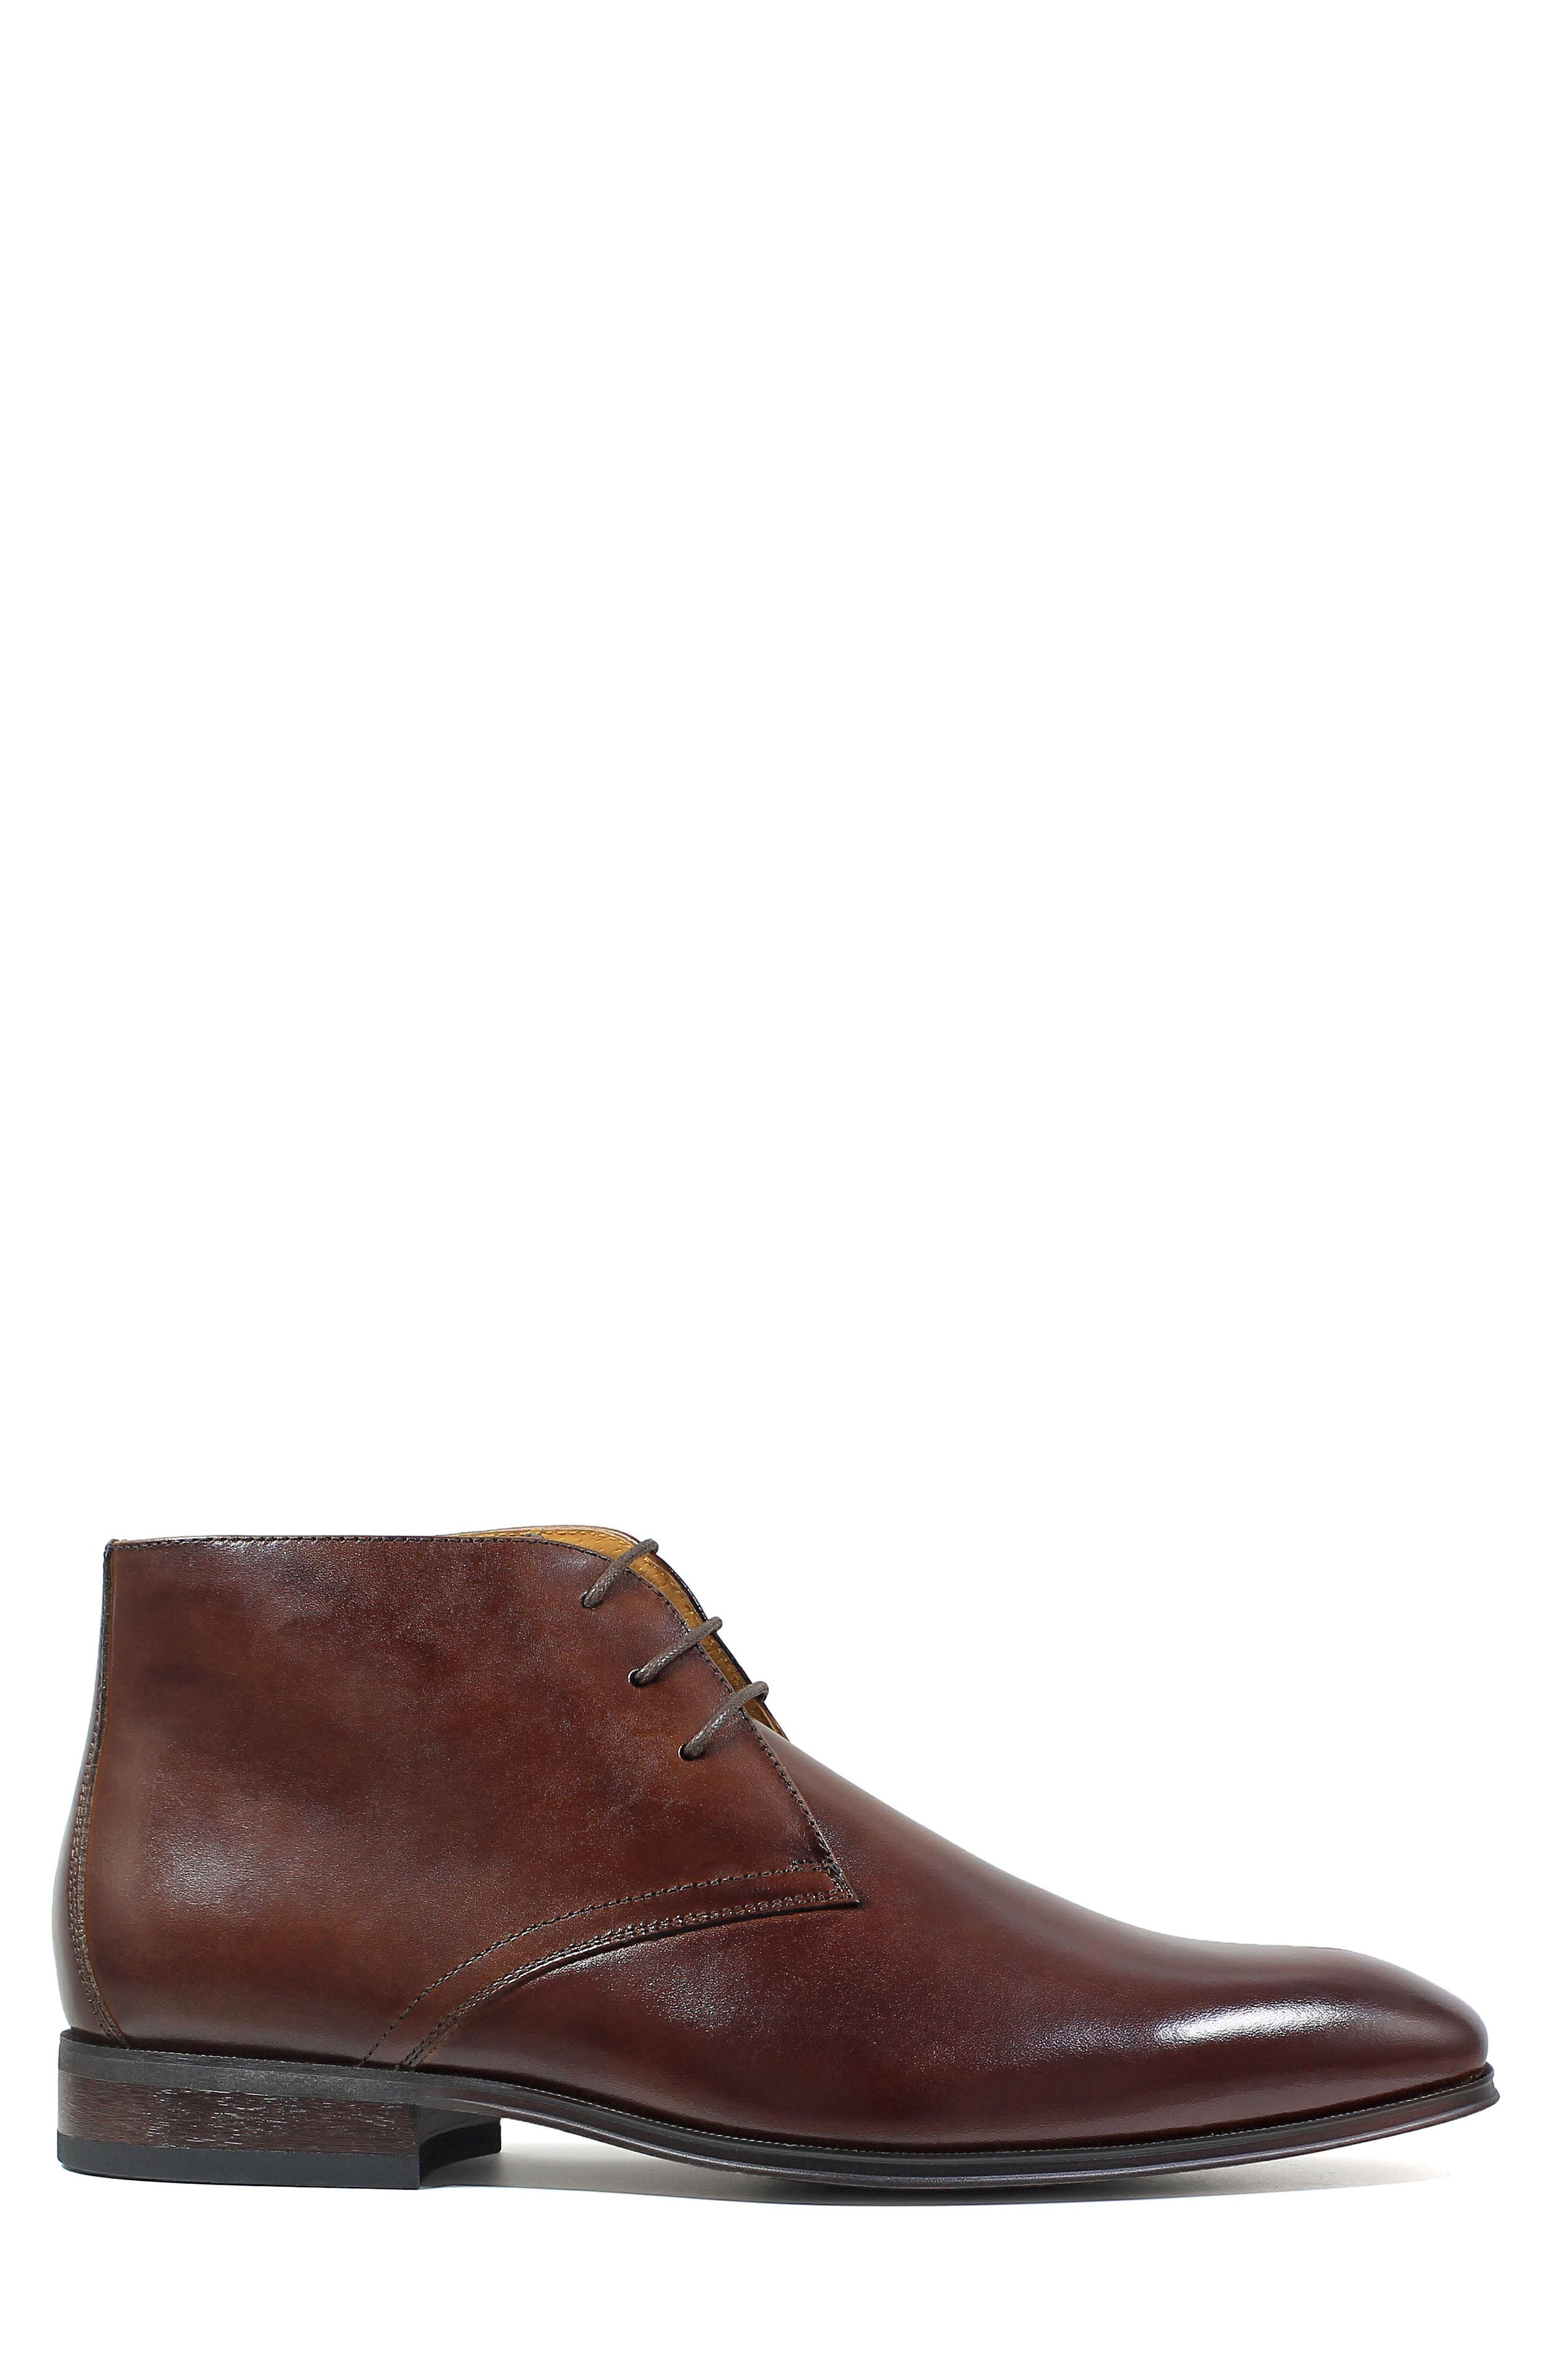 Corbetta Chukka Boot,                             Alternate thumbnail 3, color,                             Cognac Leather